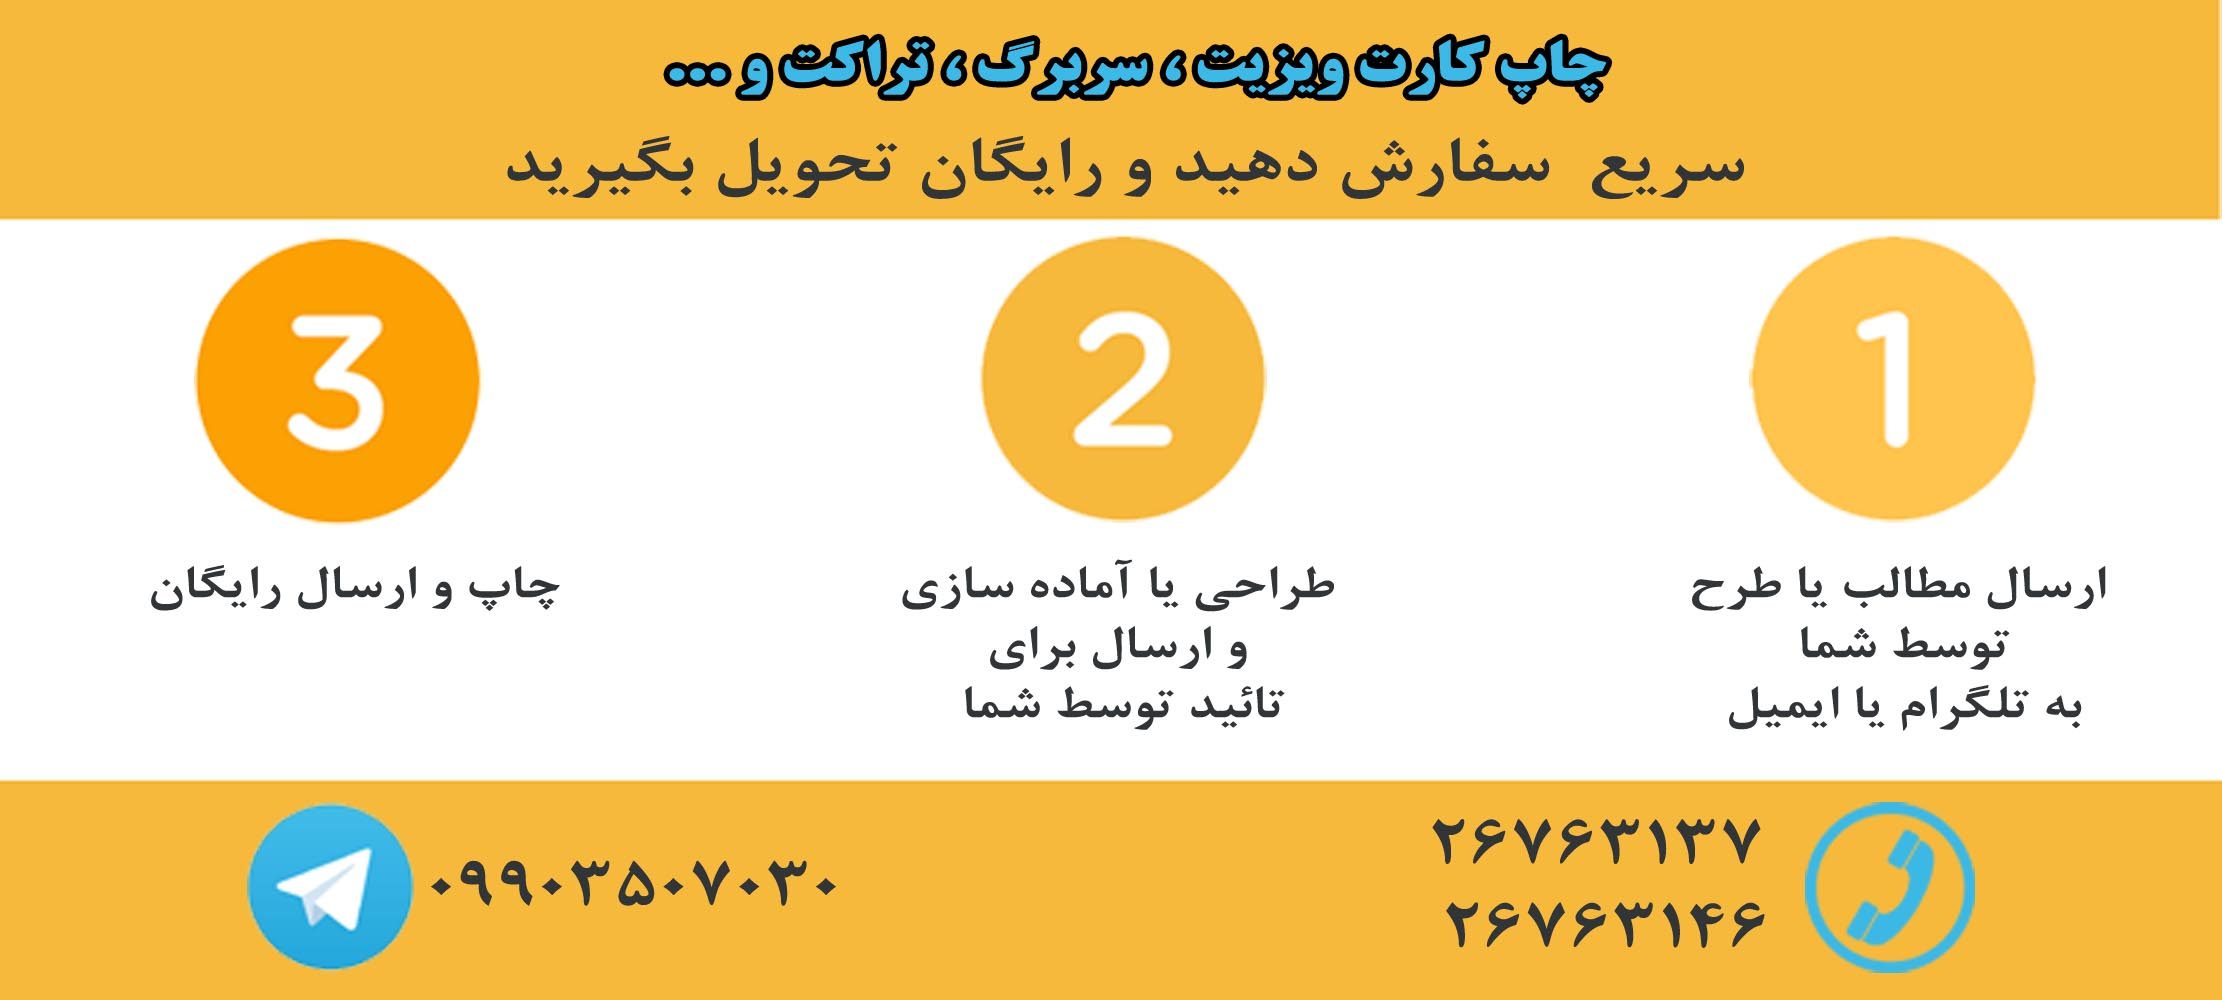 چاپ کارت ویزیت و تراکت و سربرگ و فاکتور در شهرک غرب